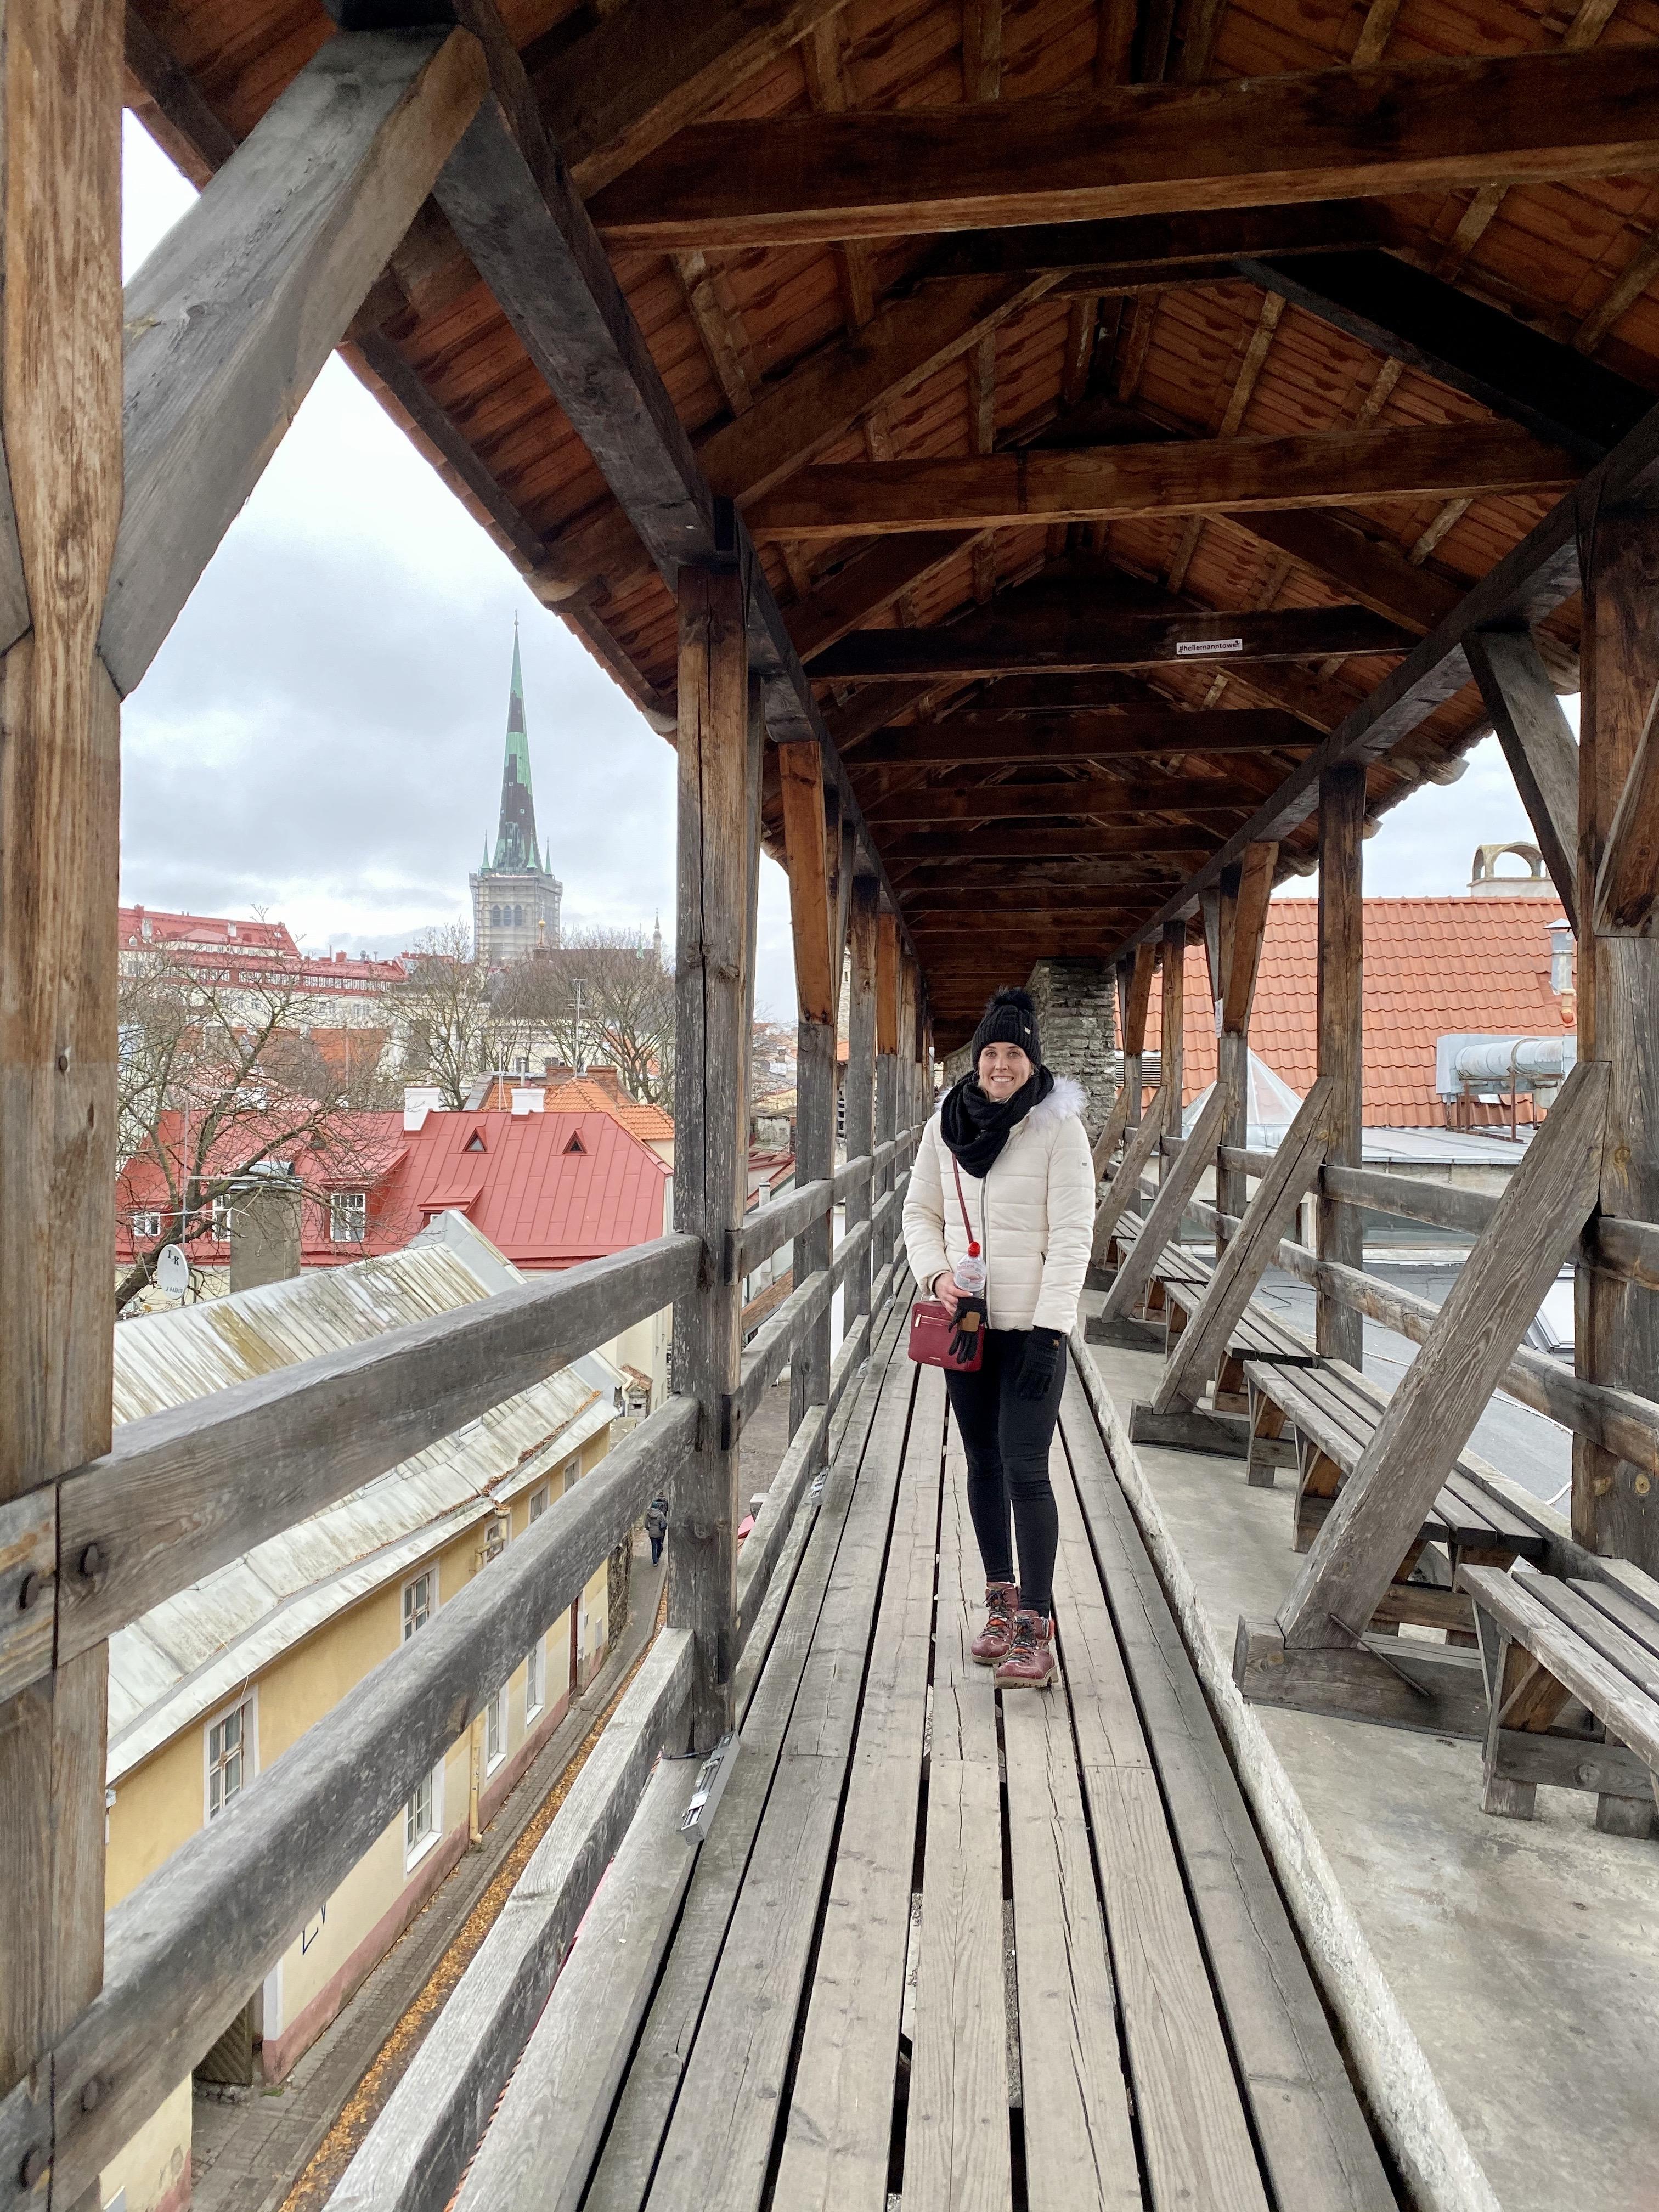 Erinn walking along the medieval city walls of Tallinn, Estonia.